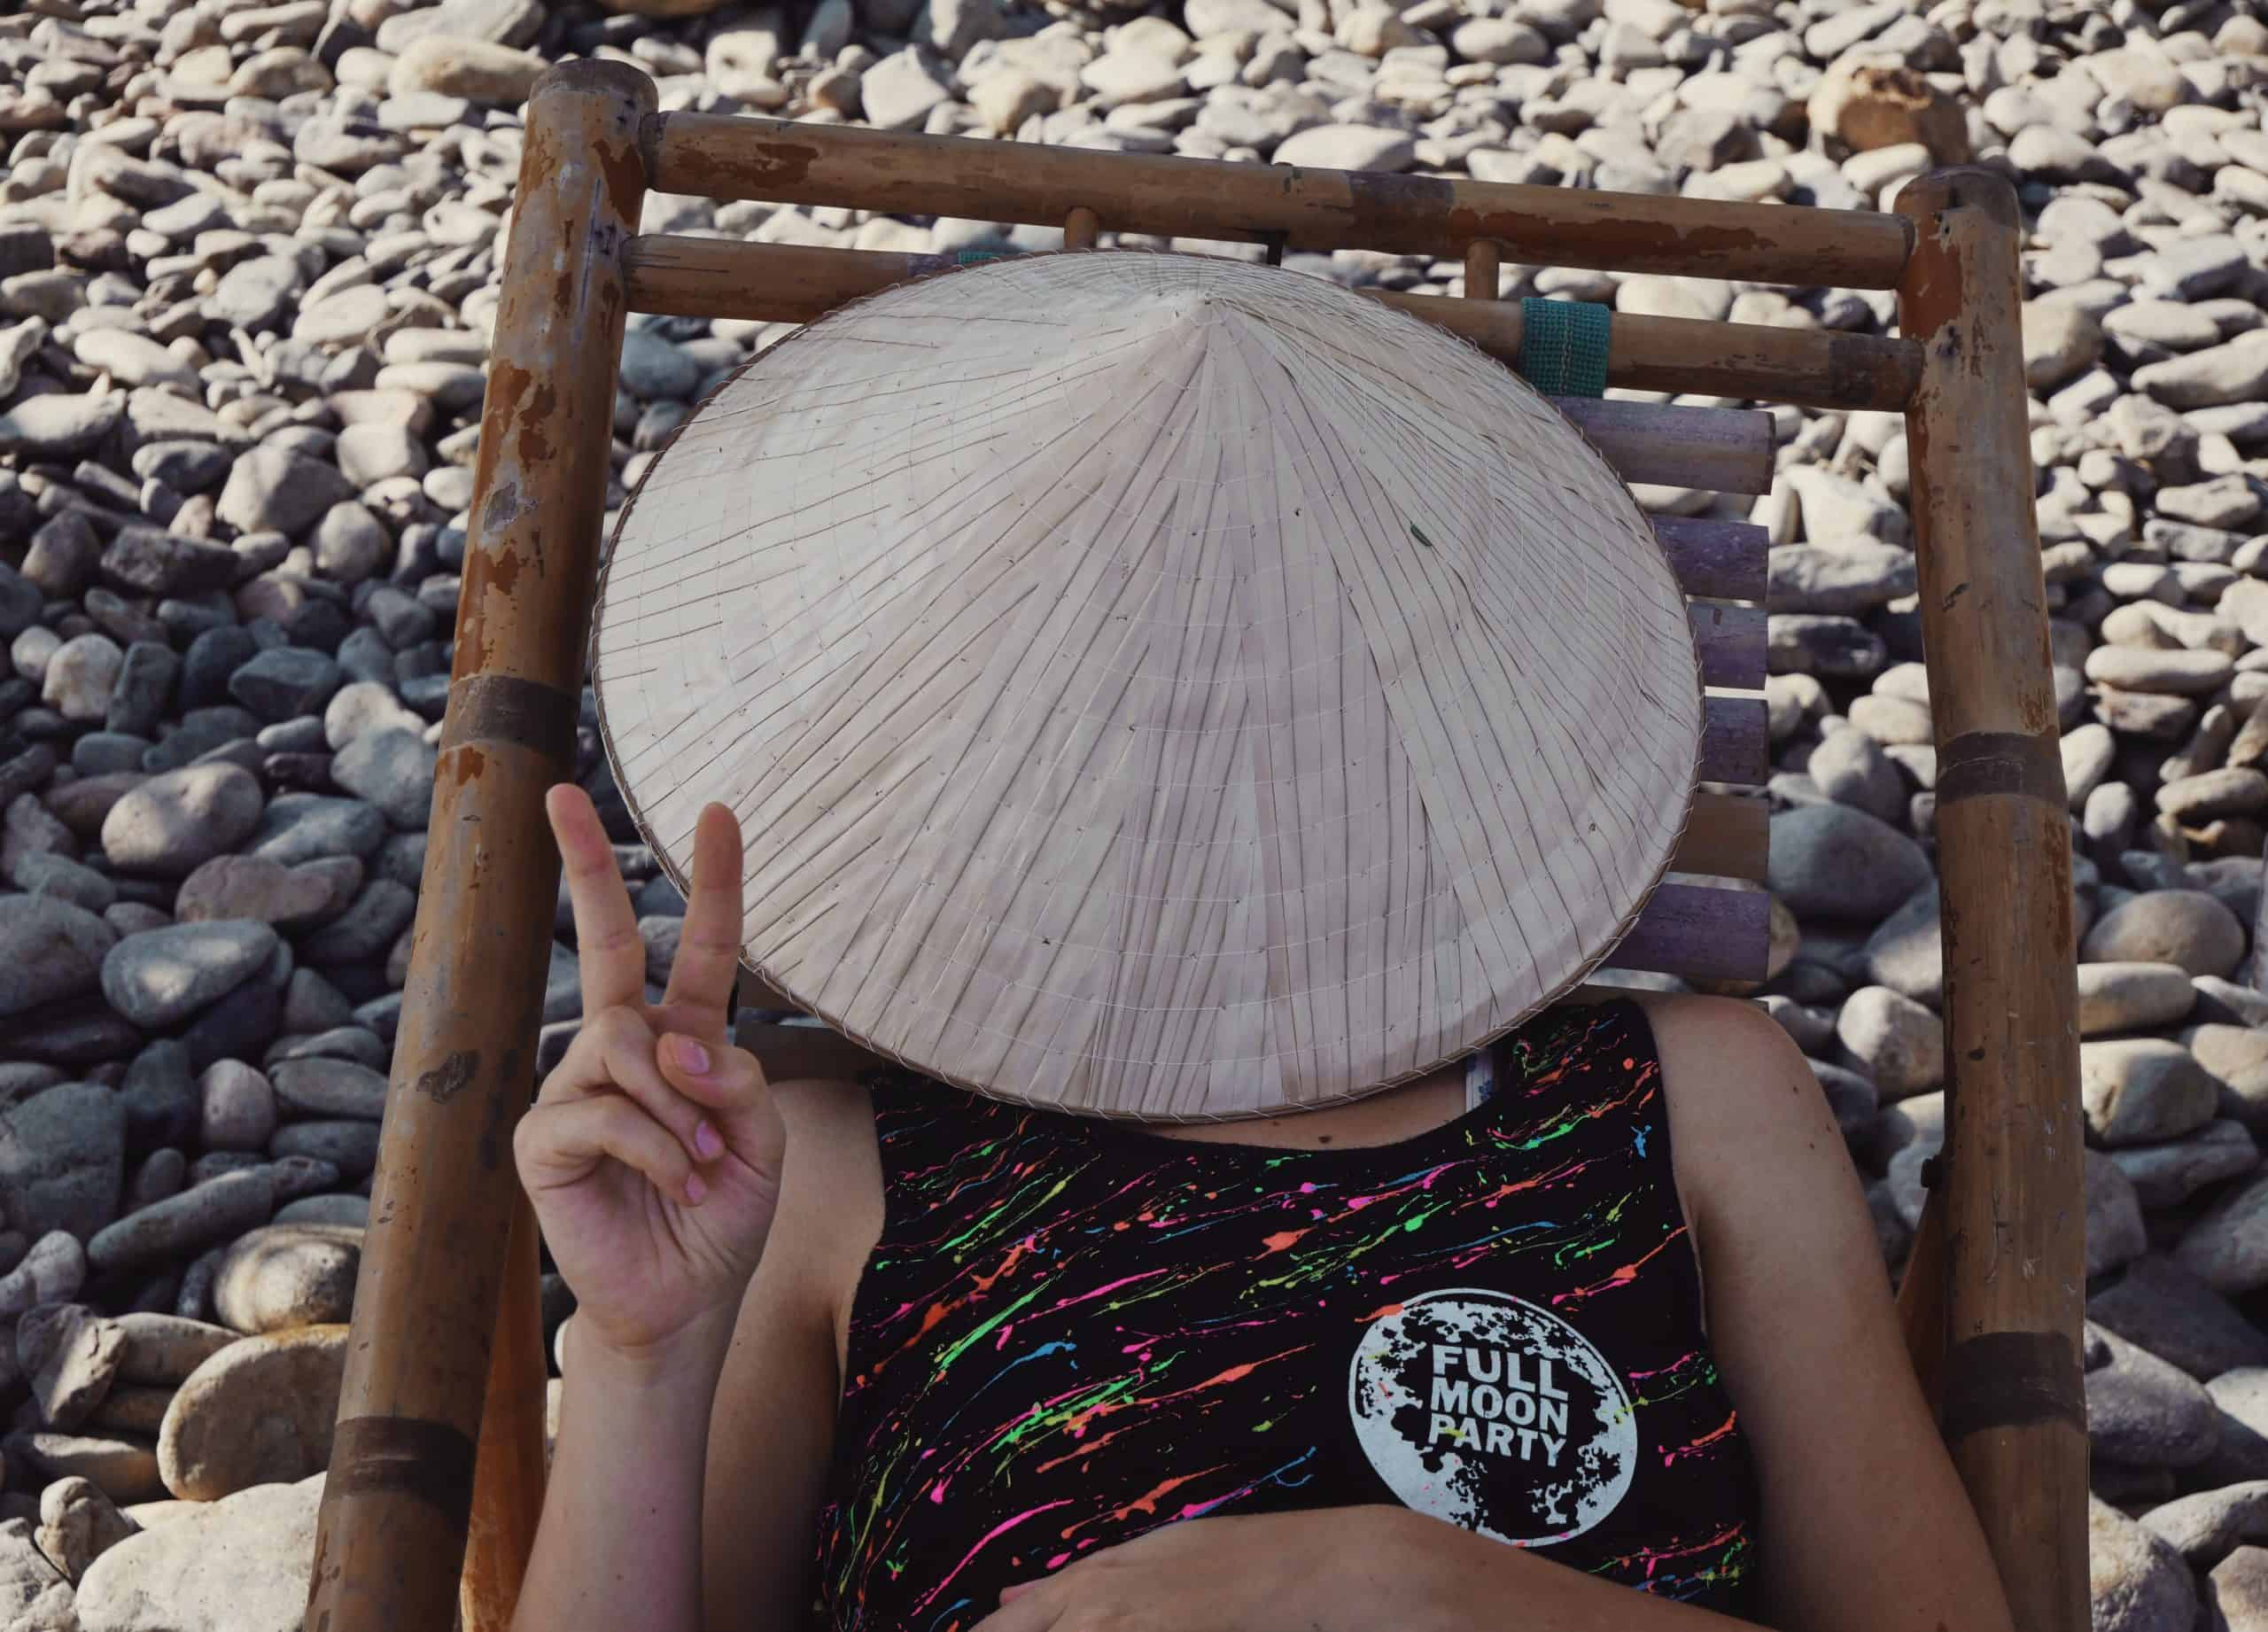 Full Moon Party 2020 Dates: Beach, Buckets, Party!